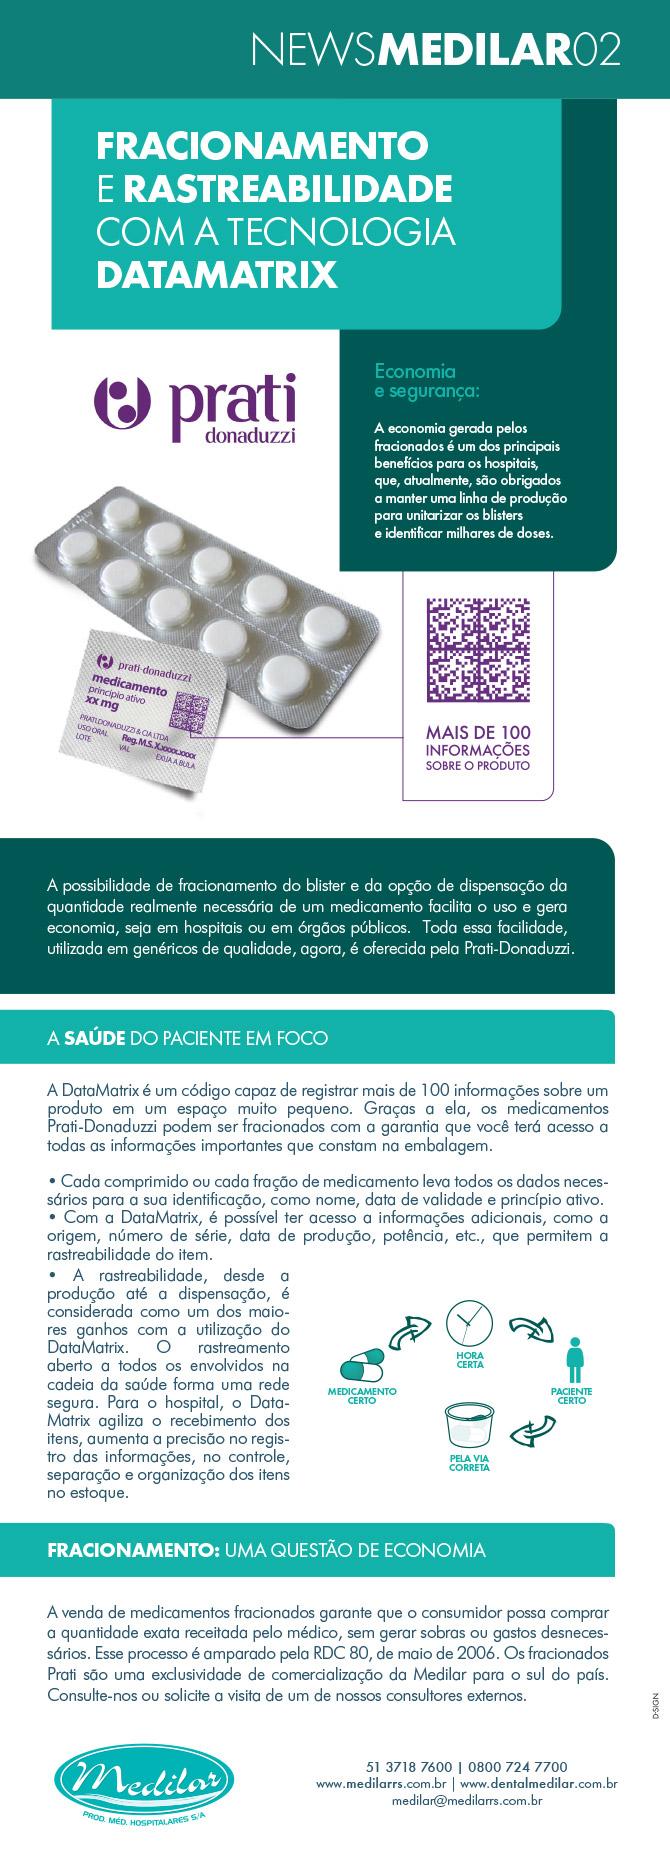 26322_art_news02_medicamentos_prati_donaduzzi-blog